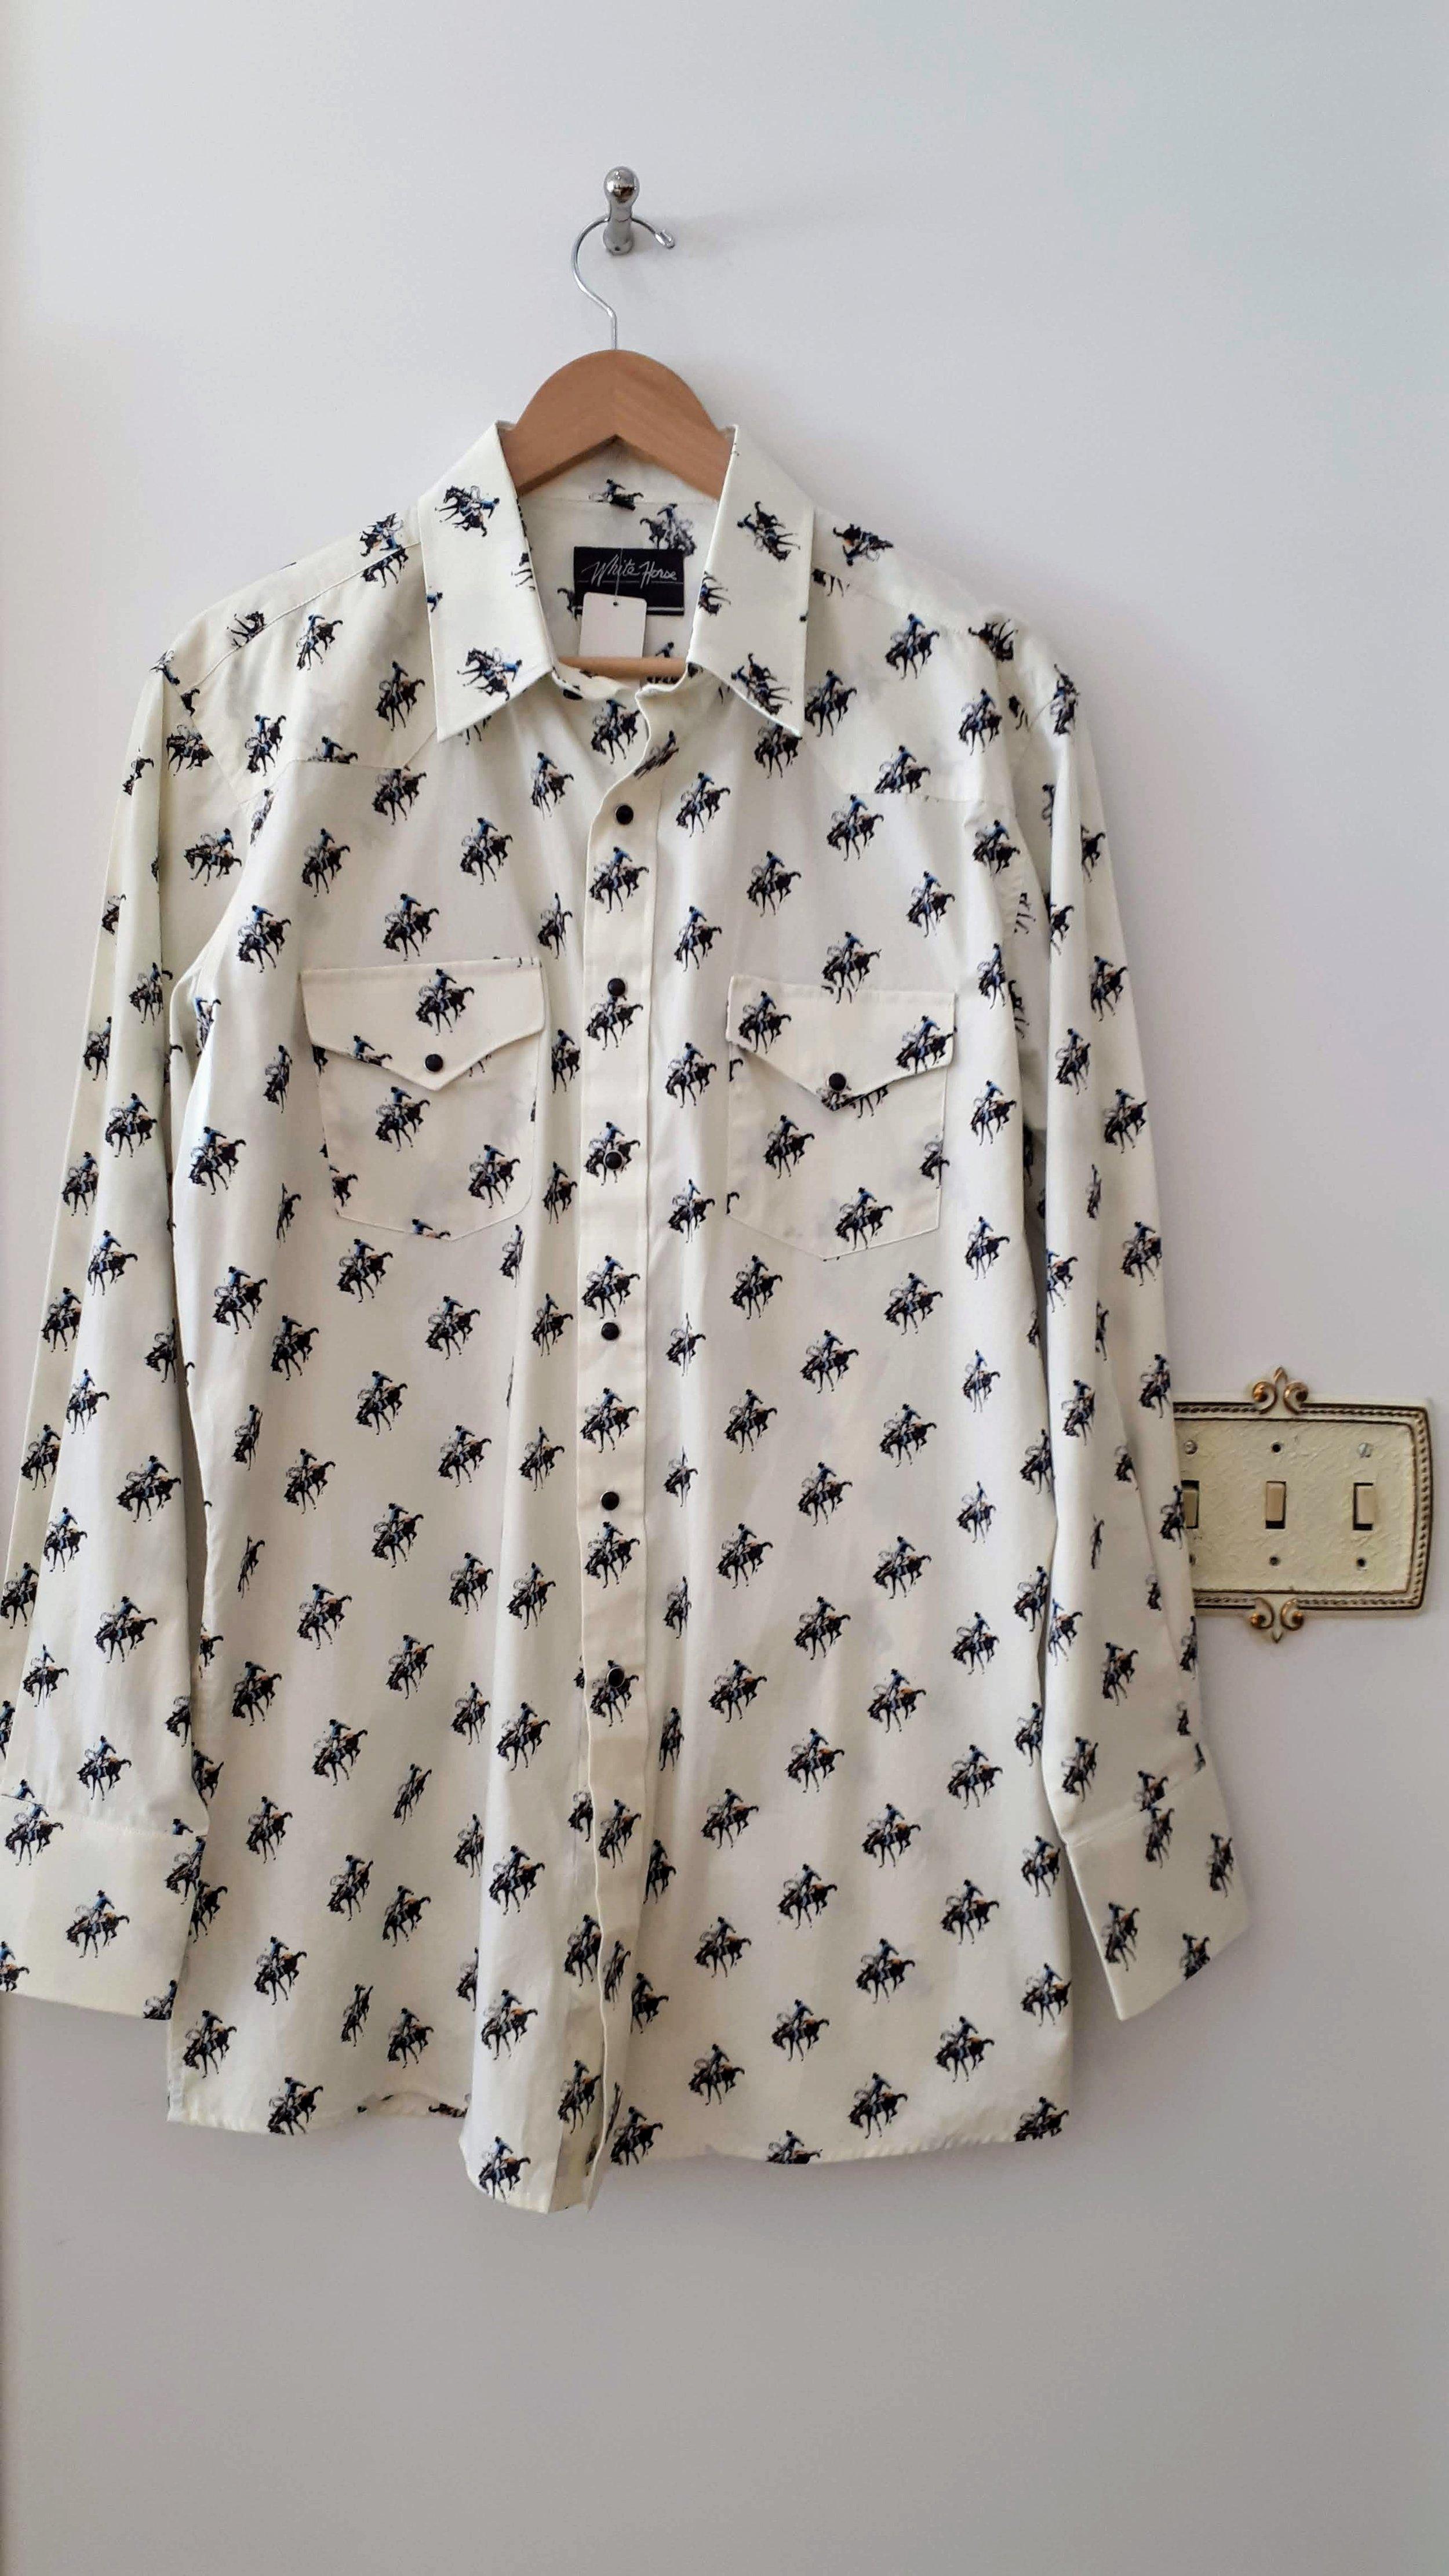 White Horse shirt; Size L, $40